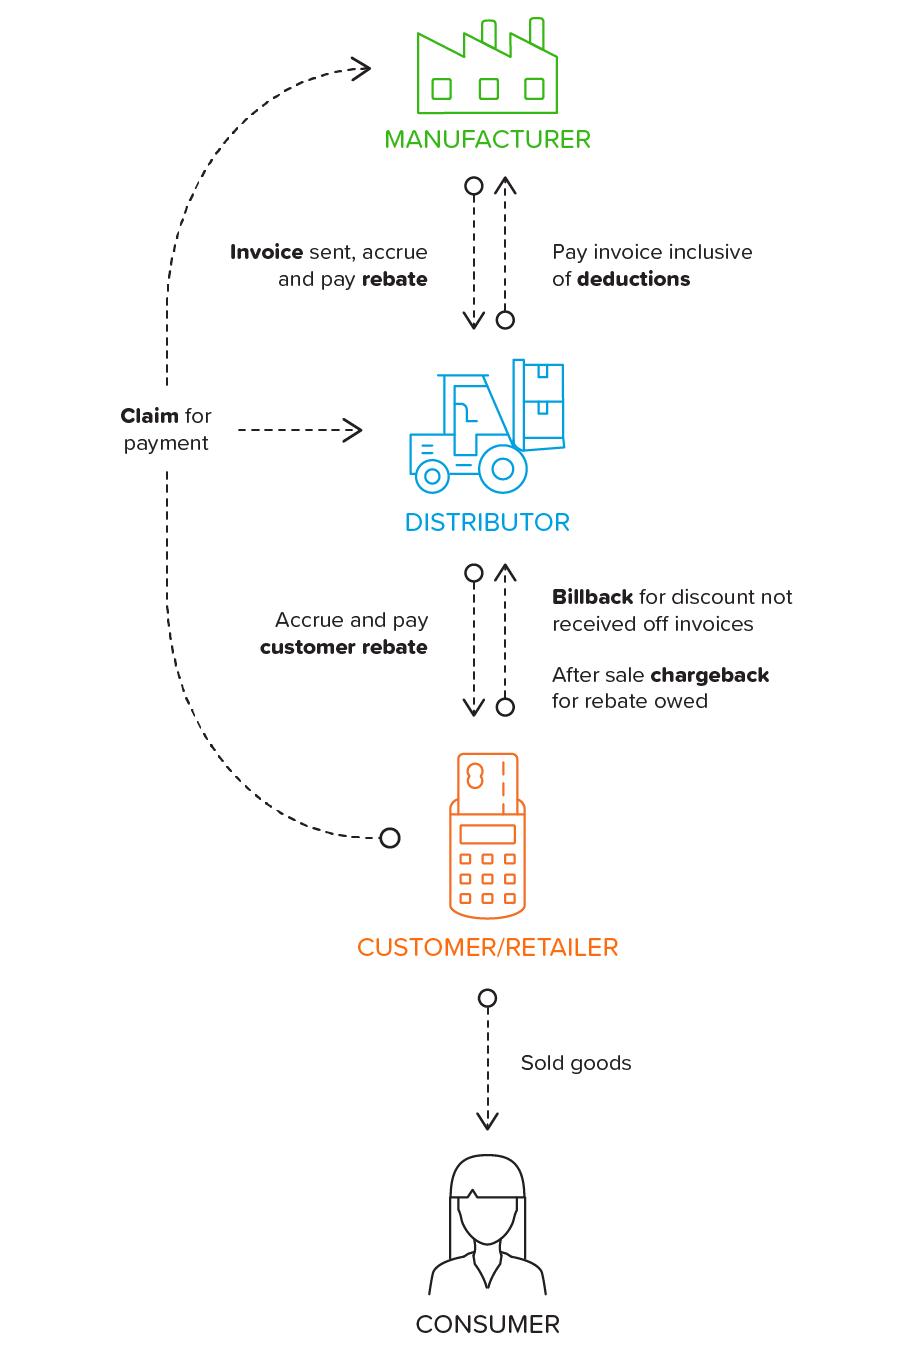 Supply chain rebate management infographic